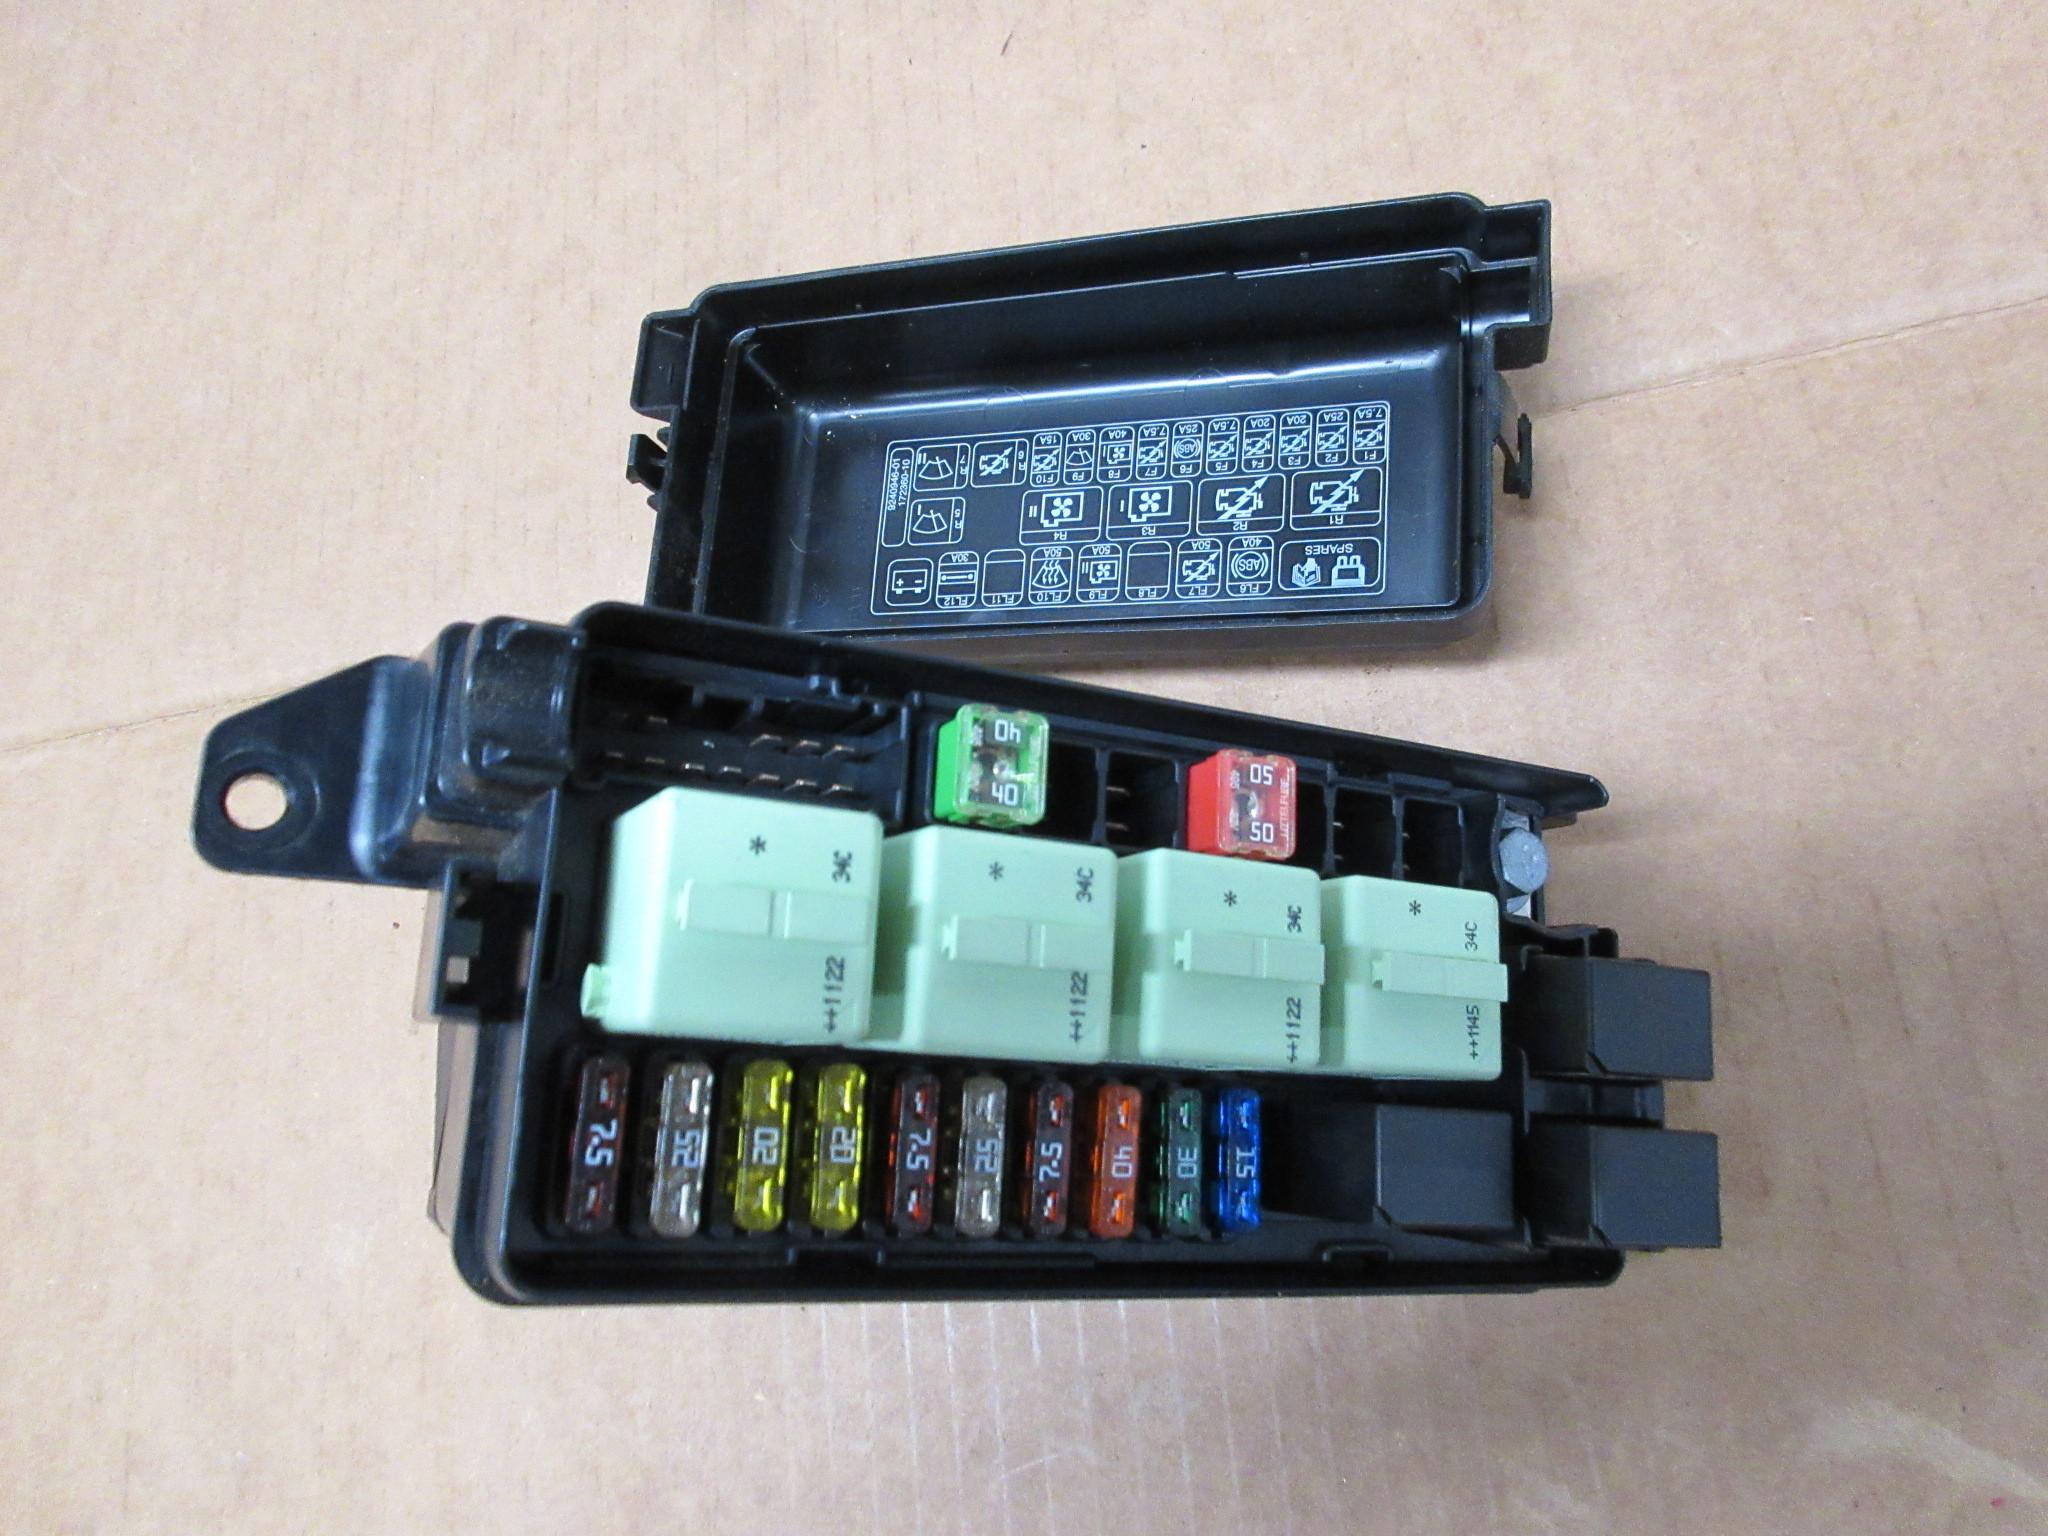 2012 Mini Cooper S R56 #1027 Engine Bay Fuse/Relay Junction Box 9240943 |  PK Auto Parts Inc.PK Auto Parts Inc.